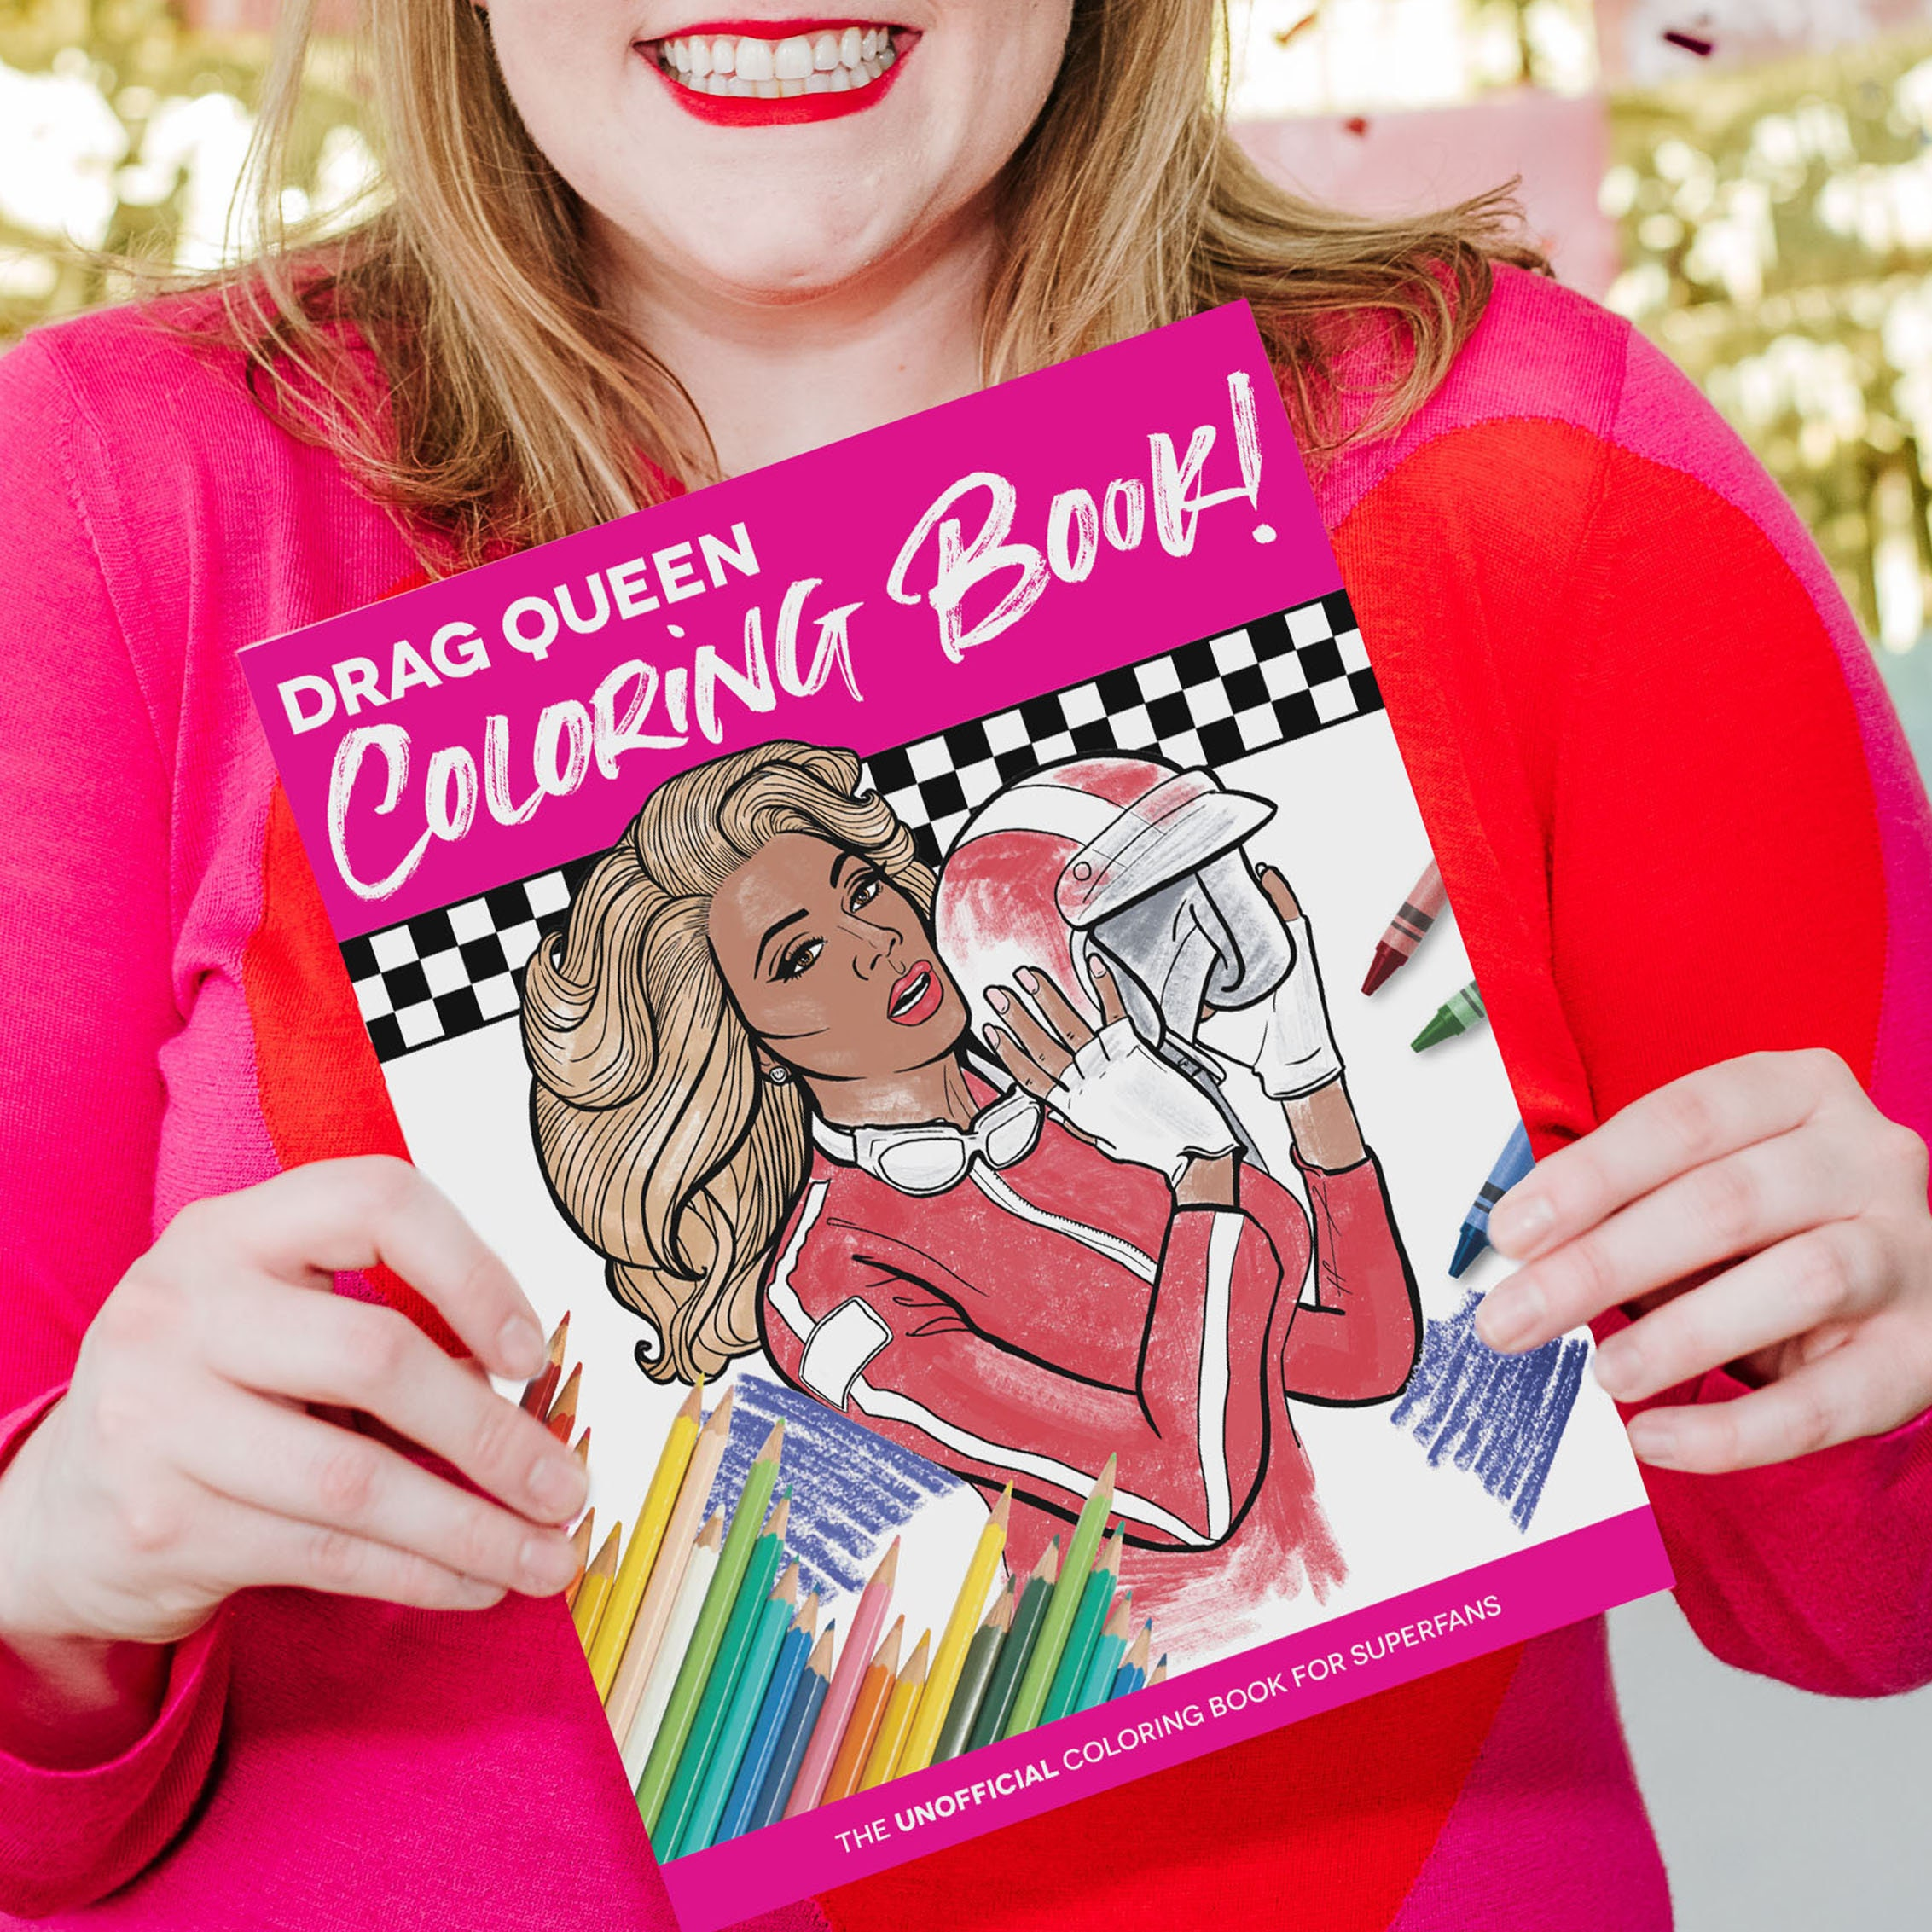 Drag Queen Adult Coloring Book   Unofficial Fan Book   Drag Fan